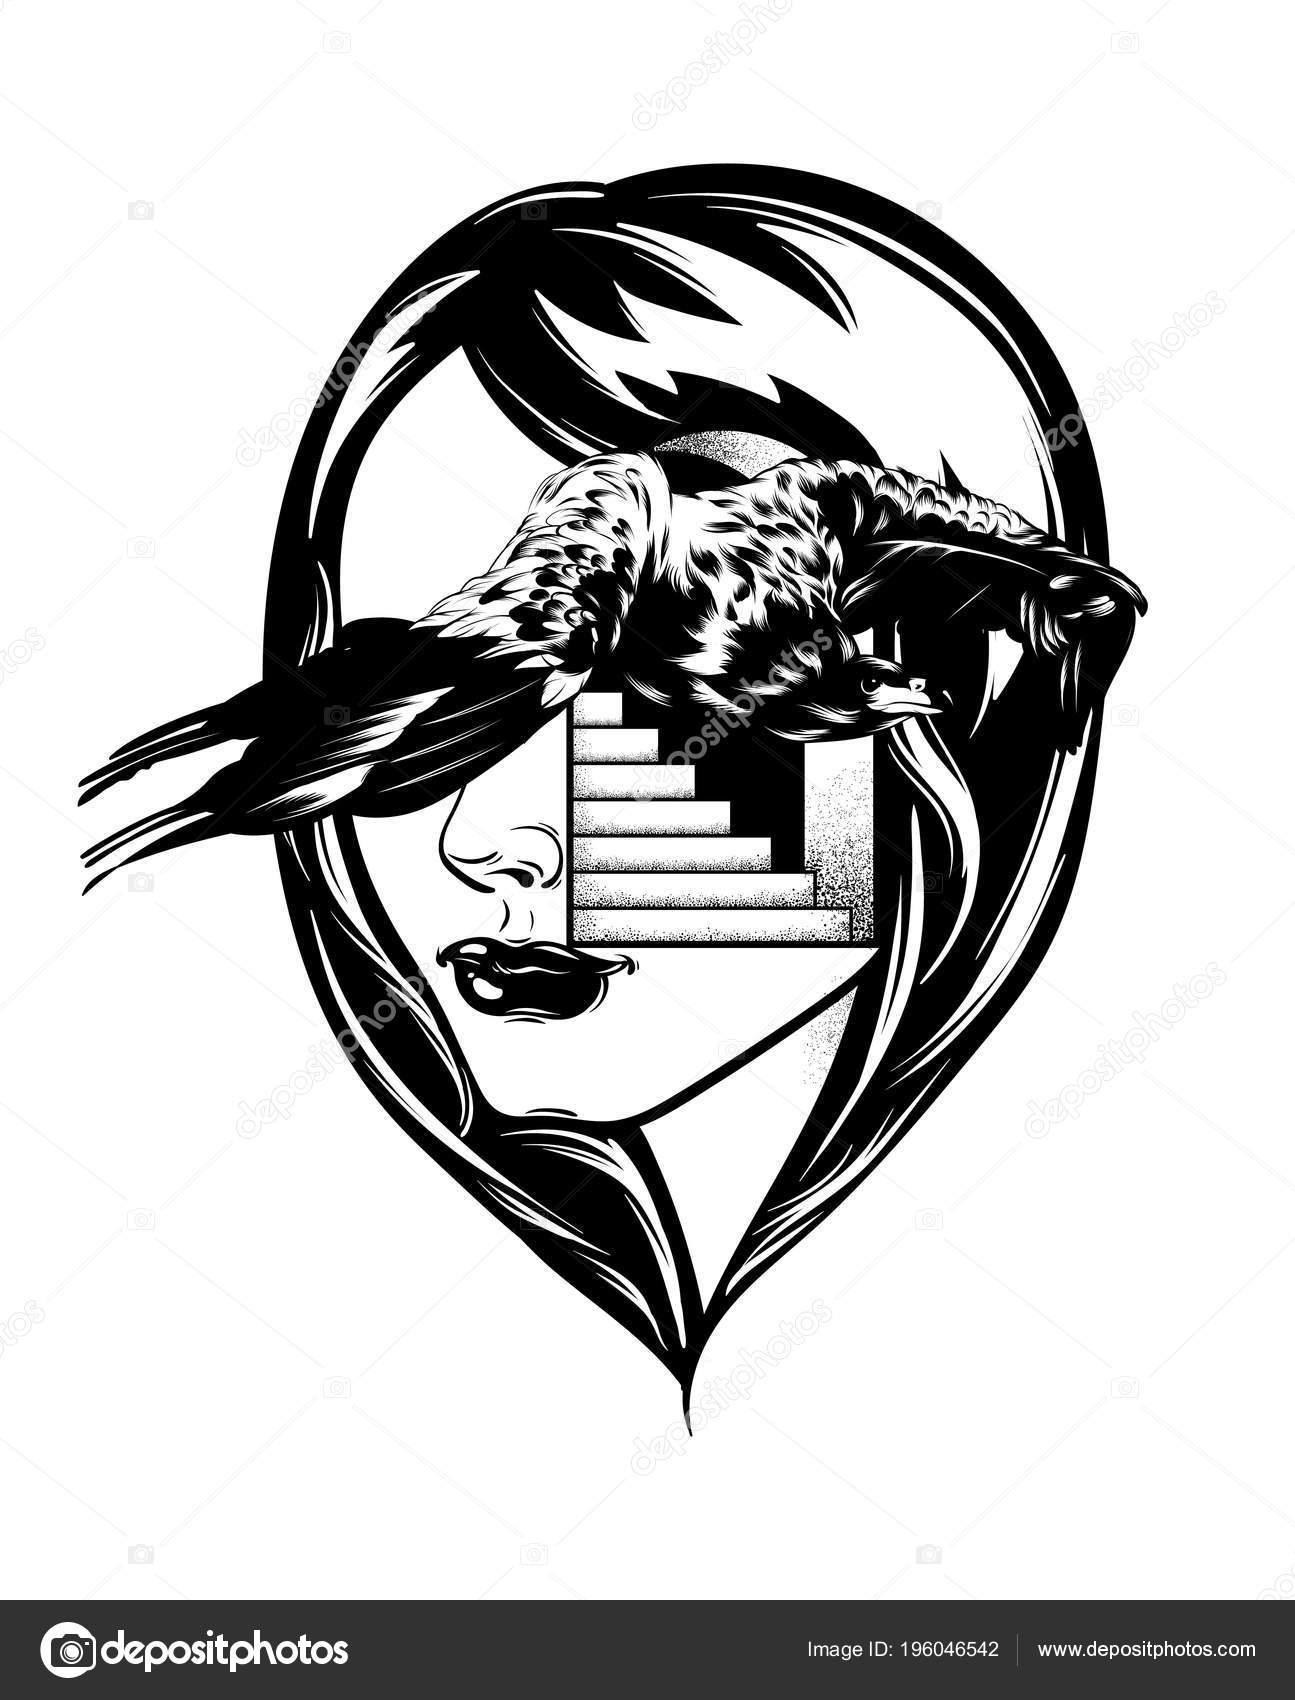 Rucne Kreslenou Vektorove Ilustrace Orel Divka Samostatny